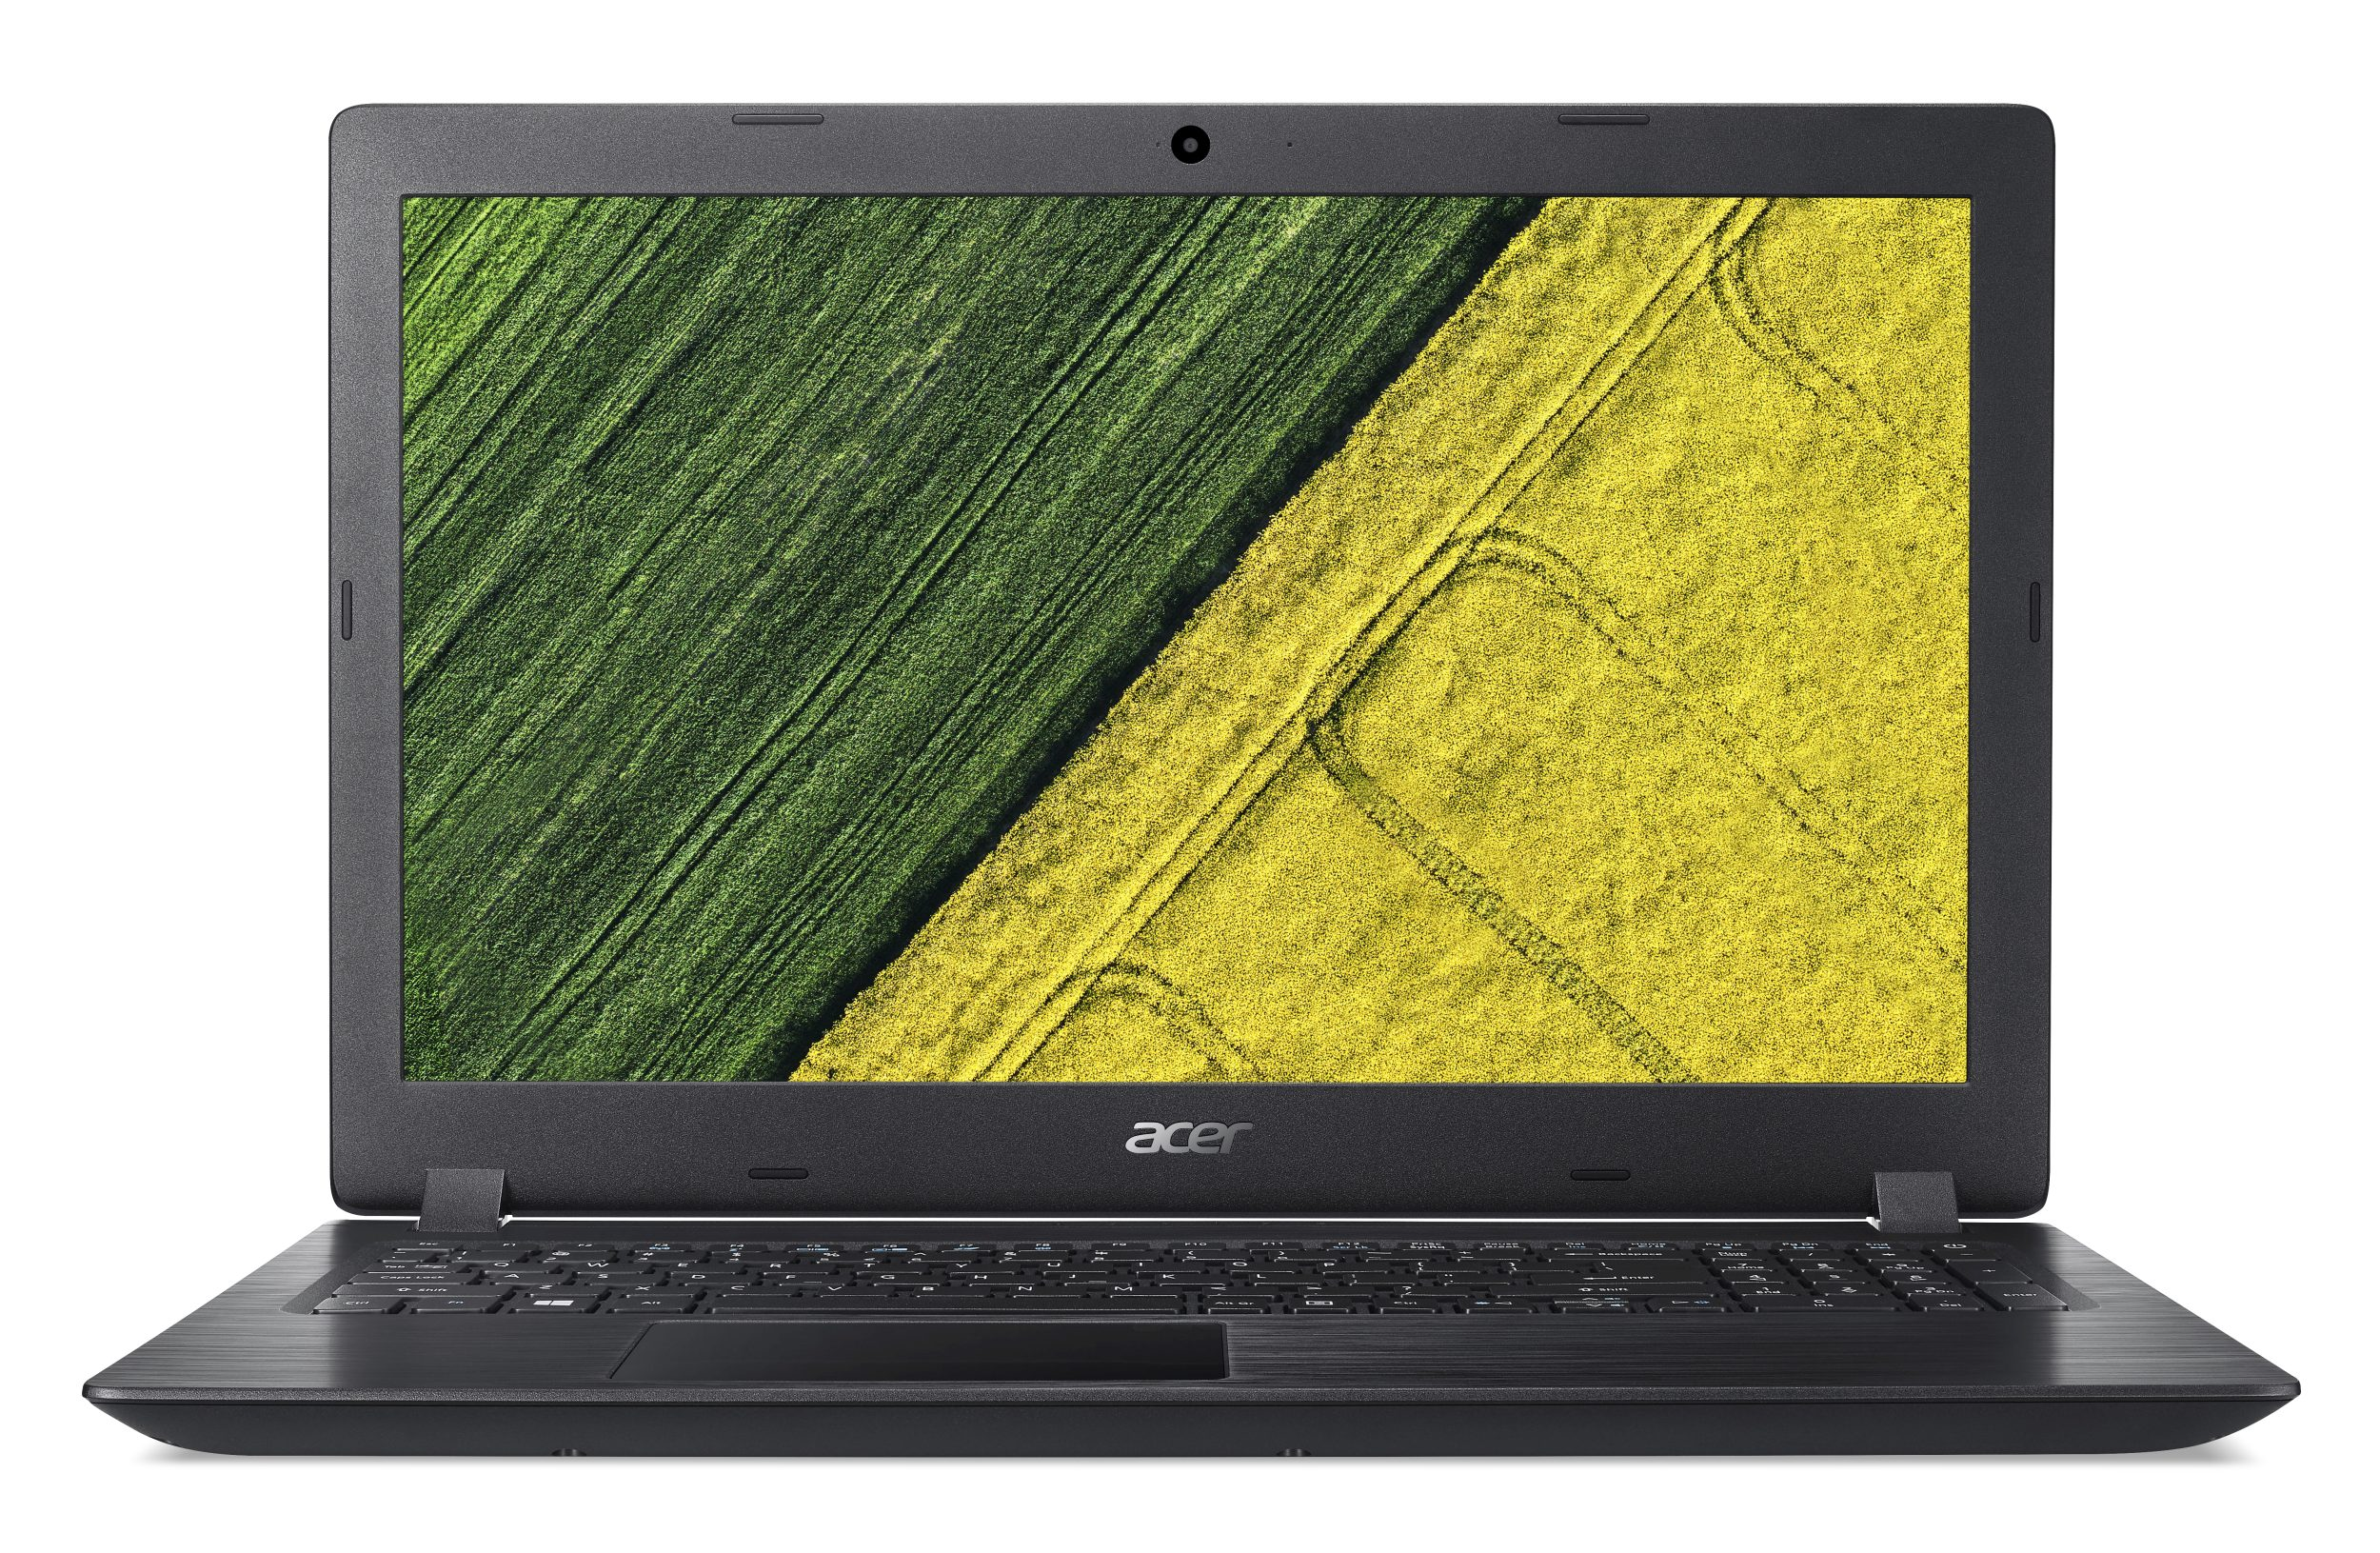 "Acer Aspire 3 (A315-21-44M0) AMD A4-9120/4GB+N/128GB SSD M.2+N/AMD Radeon/15.6"" FHD LED matný/BT/Linux/Black"